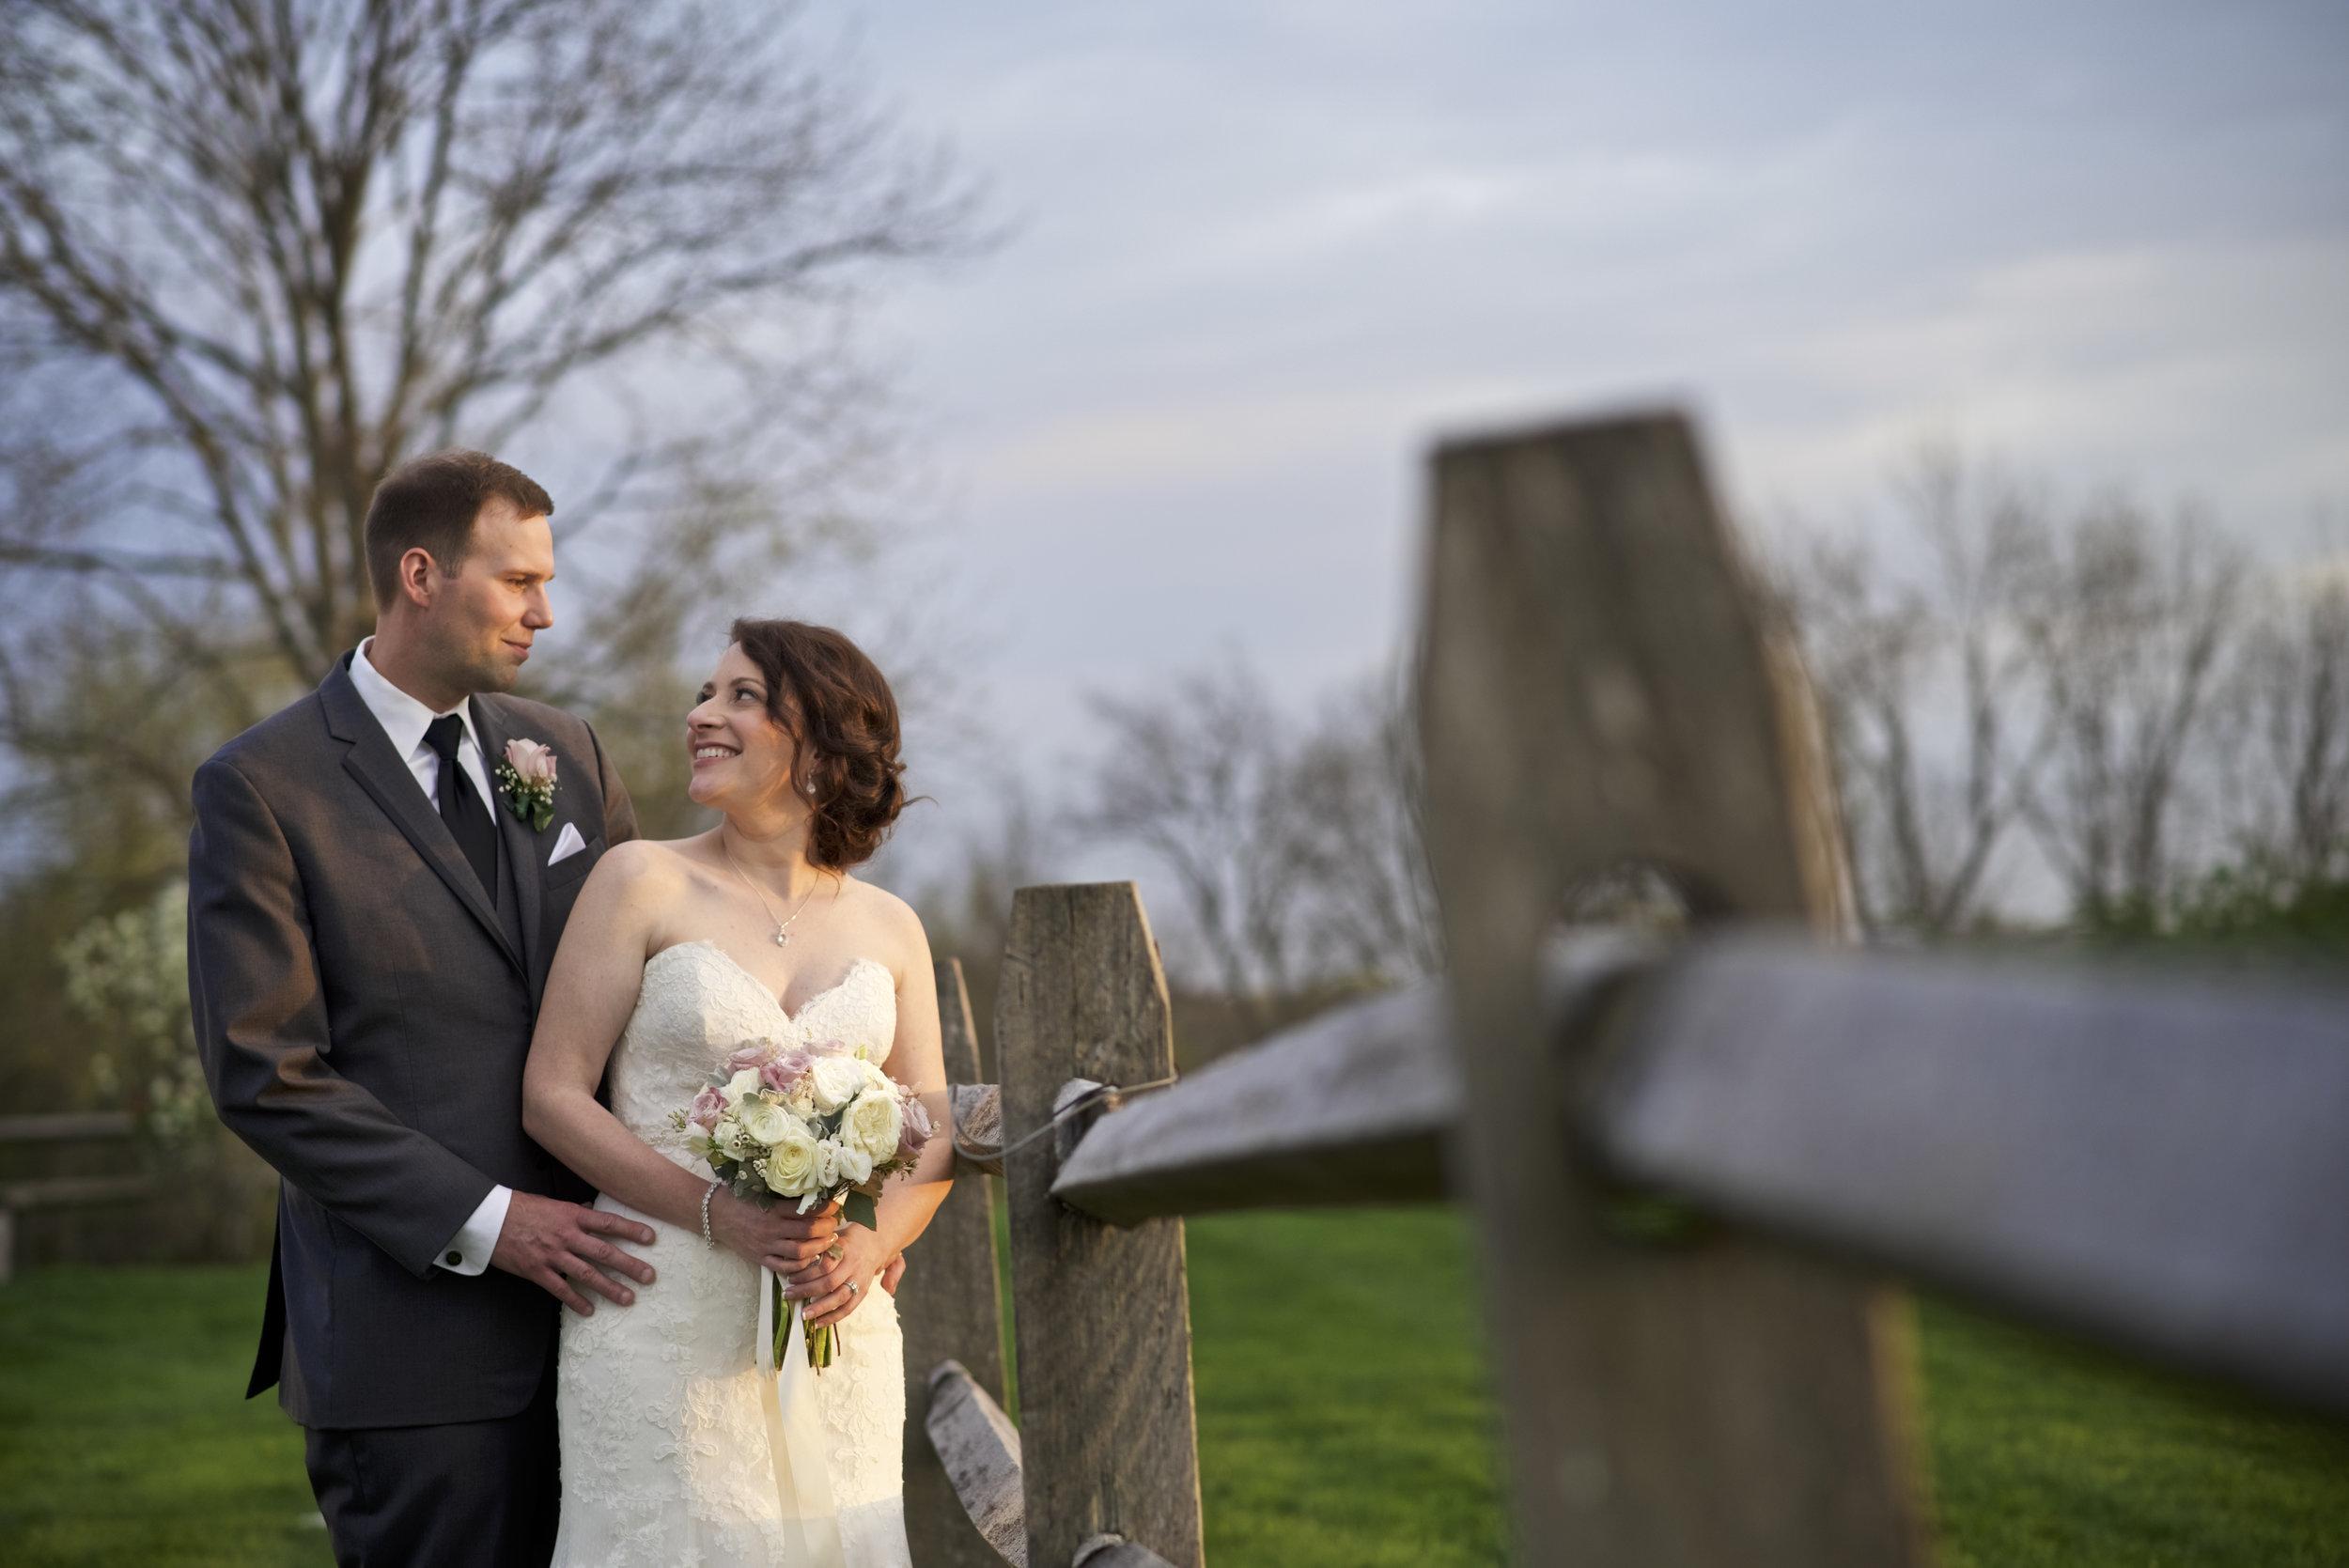 Lippincott manor wedding, wallkill ny wedding, photography, photos s.jpg